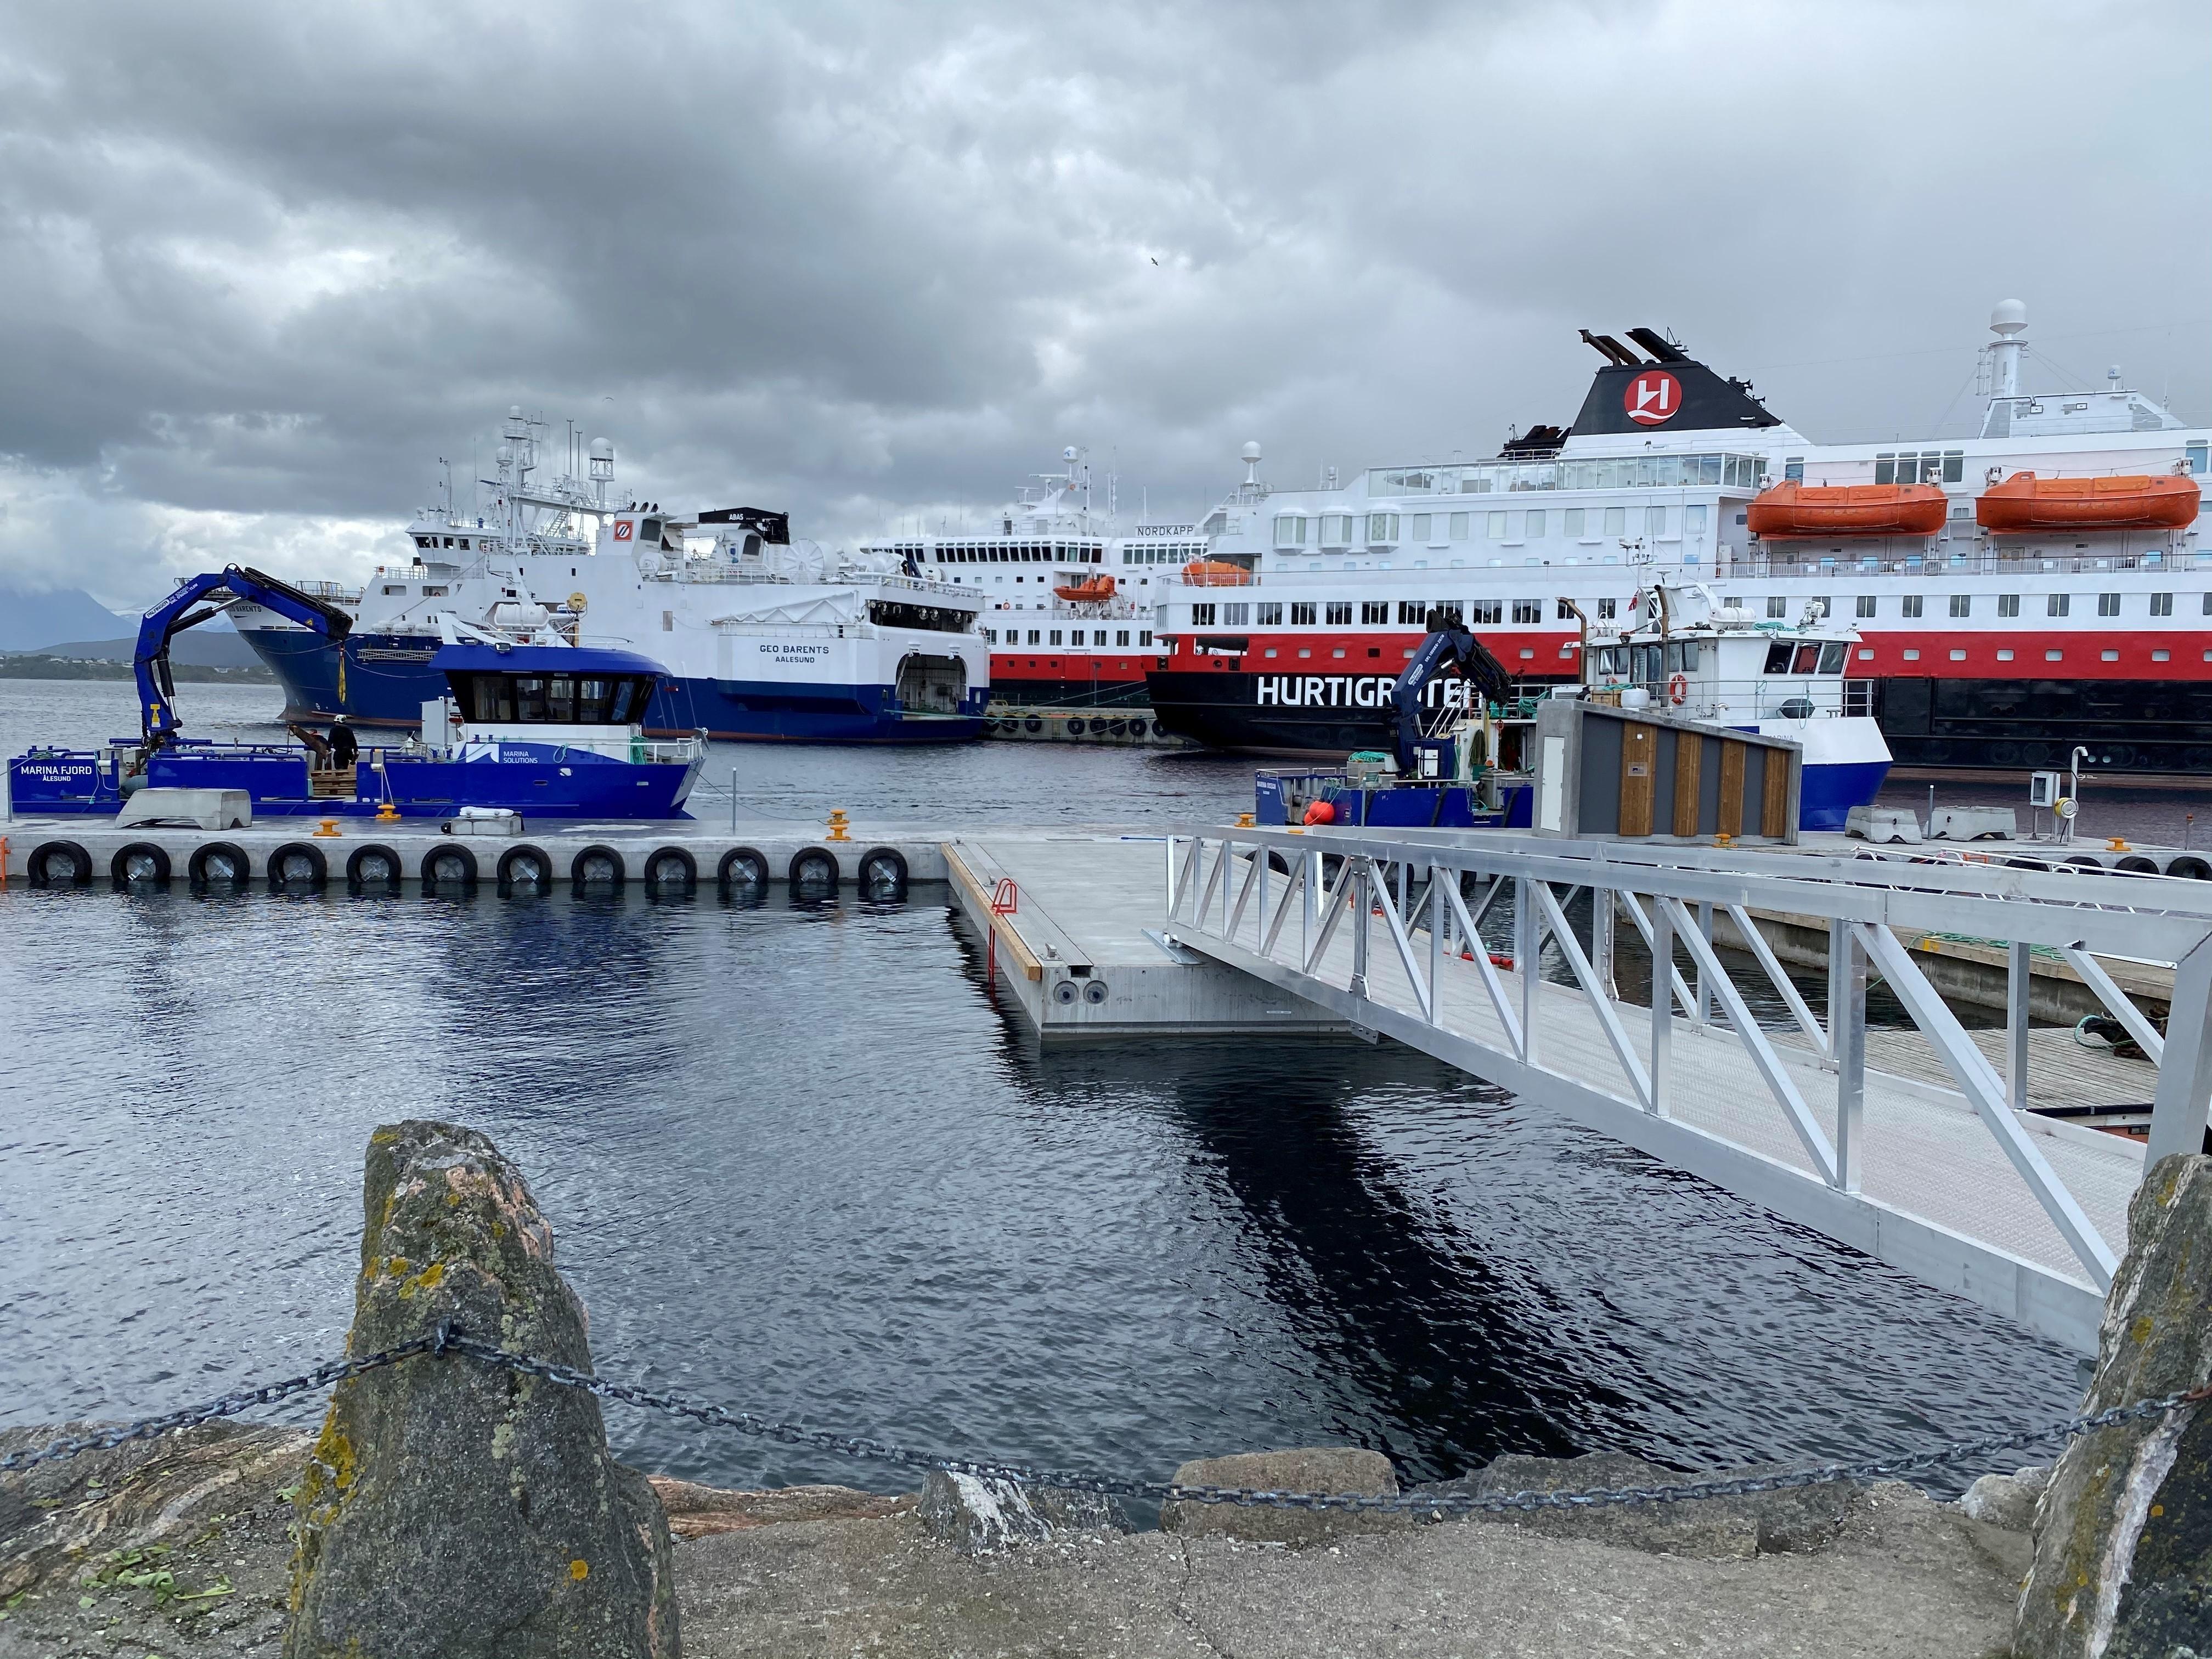 https://marinasolutions.no/uploads/Flytekai-Ålesund-Rådhusbrygga.jpg